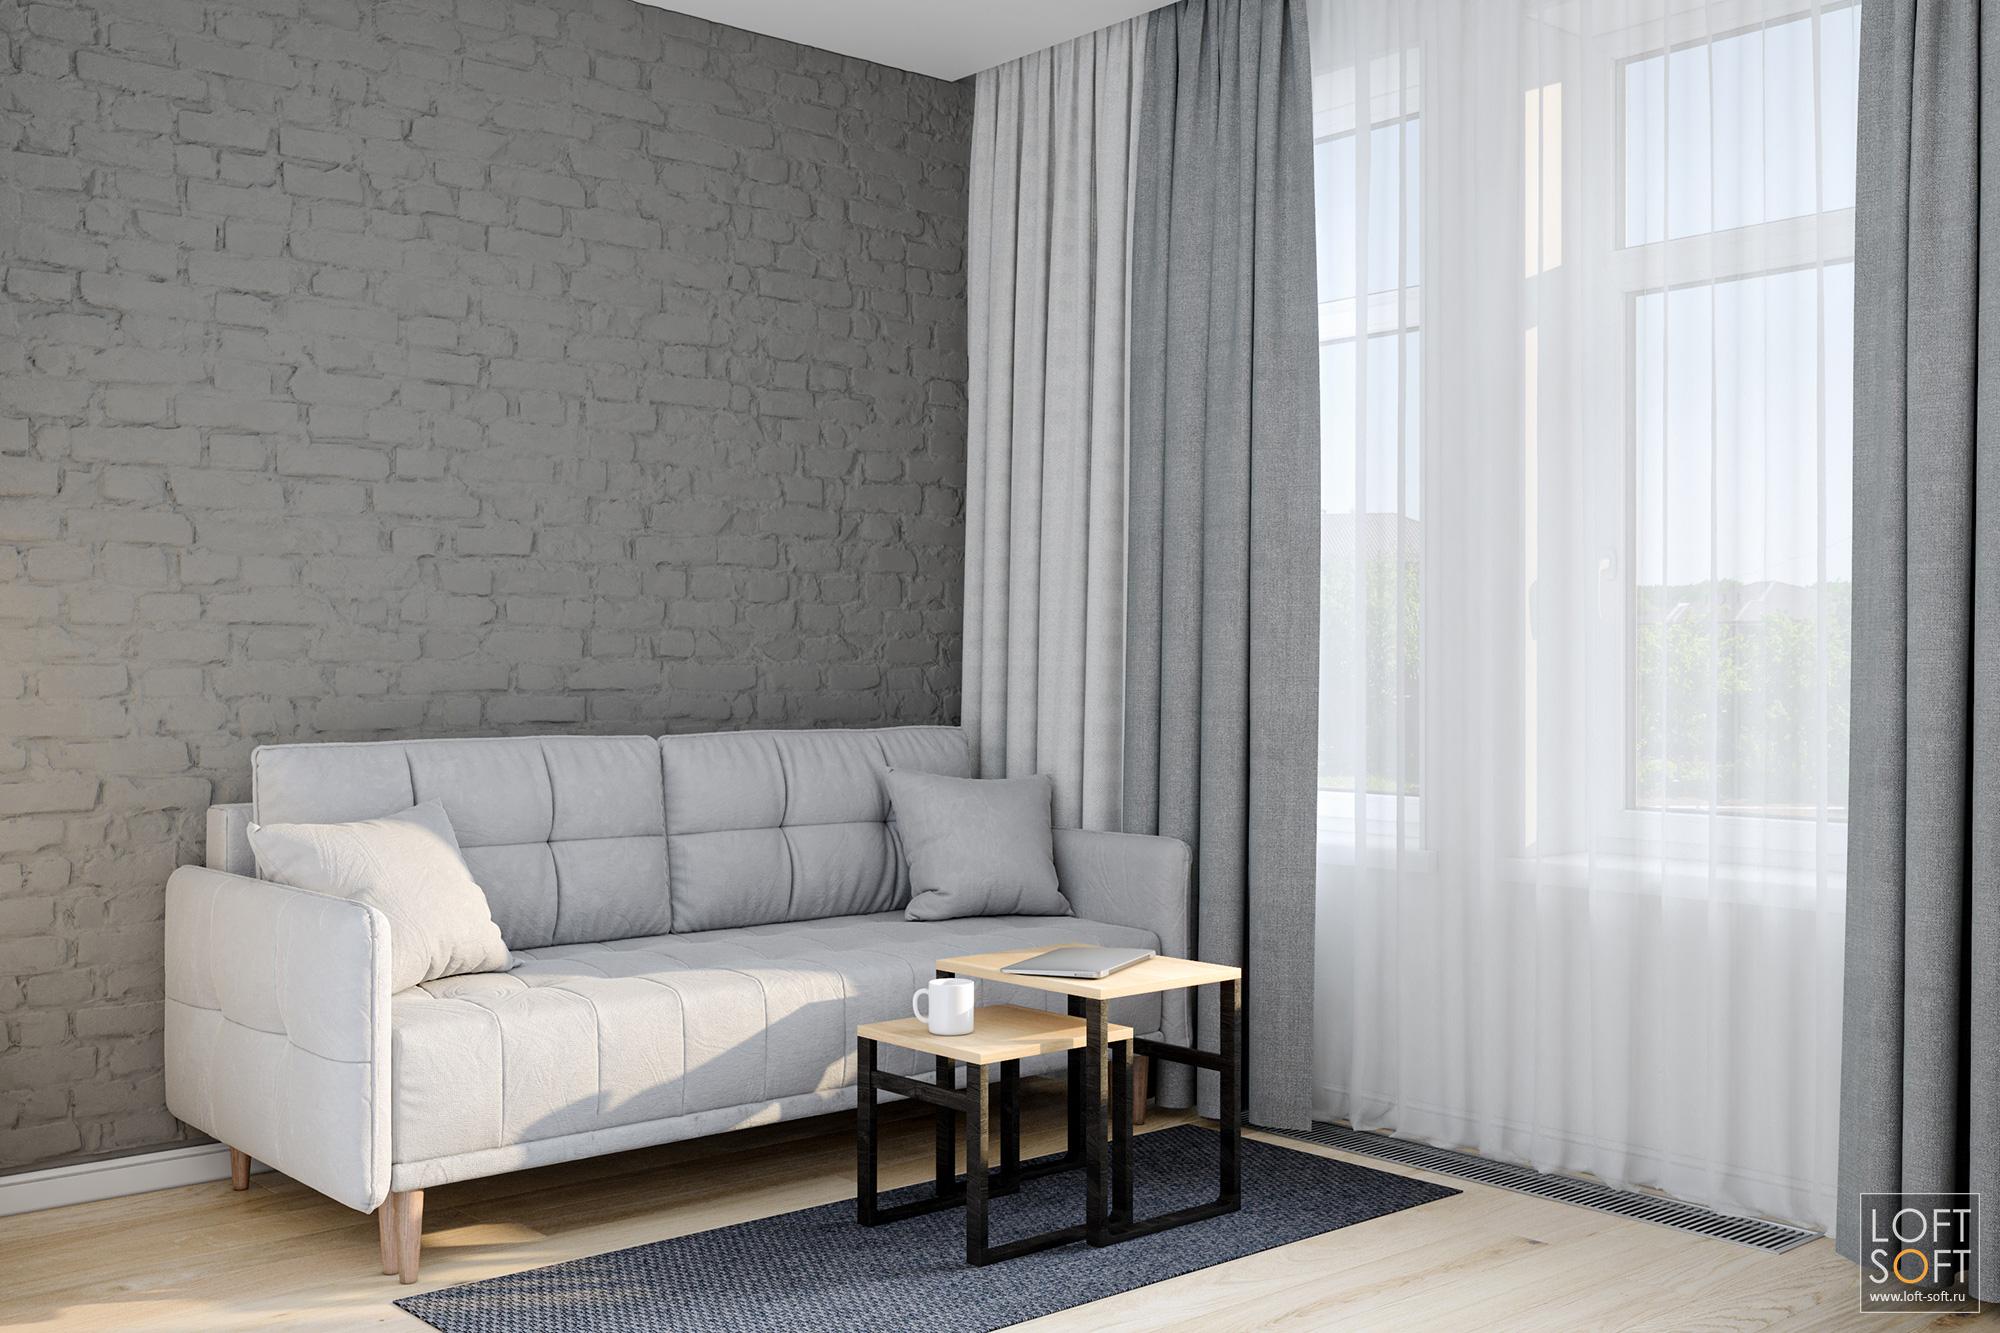 минимализм винтерьере, стена из серого клинкера, белый диван винтерьере